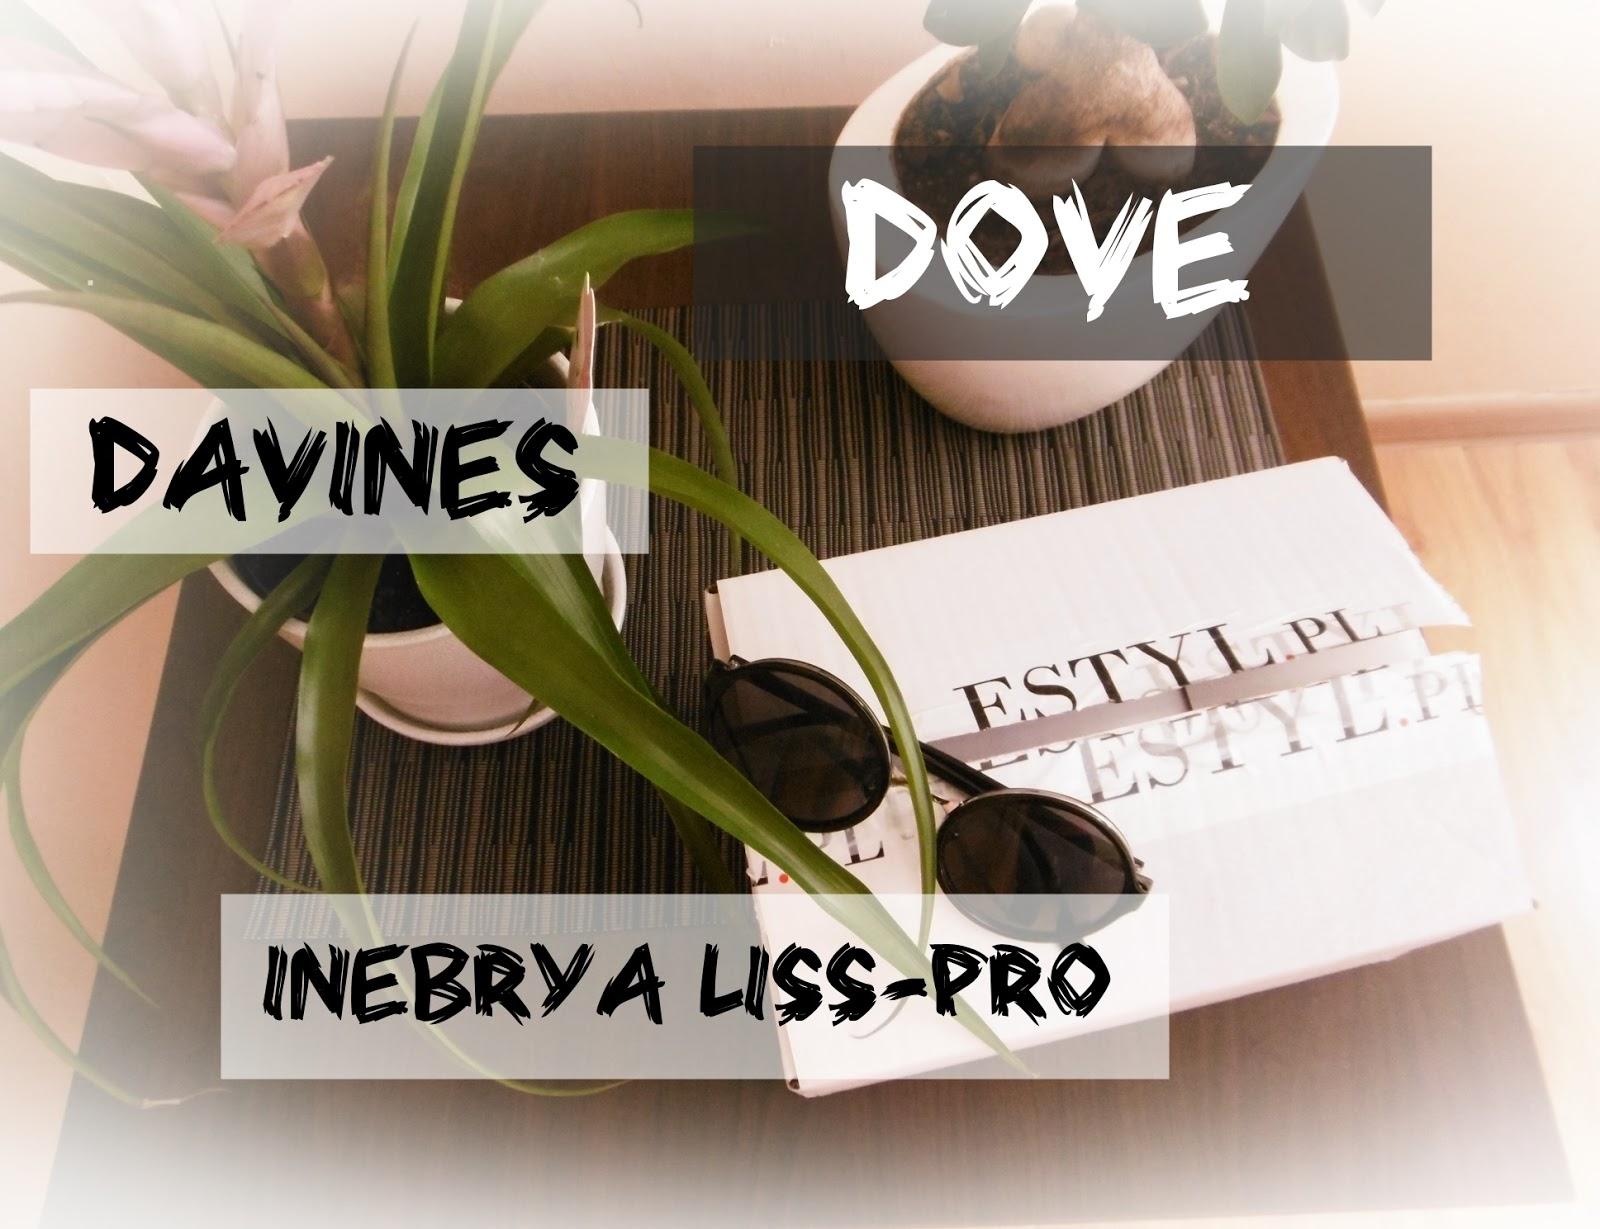 #3 OPENBOX DAVINES DOVE INEBRYA LISS-PRO